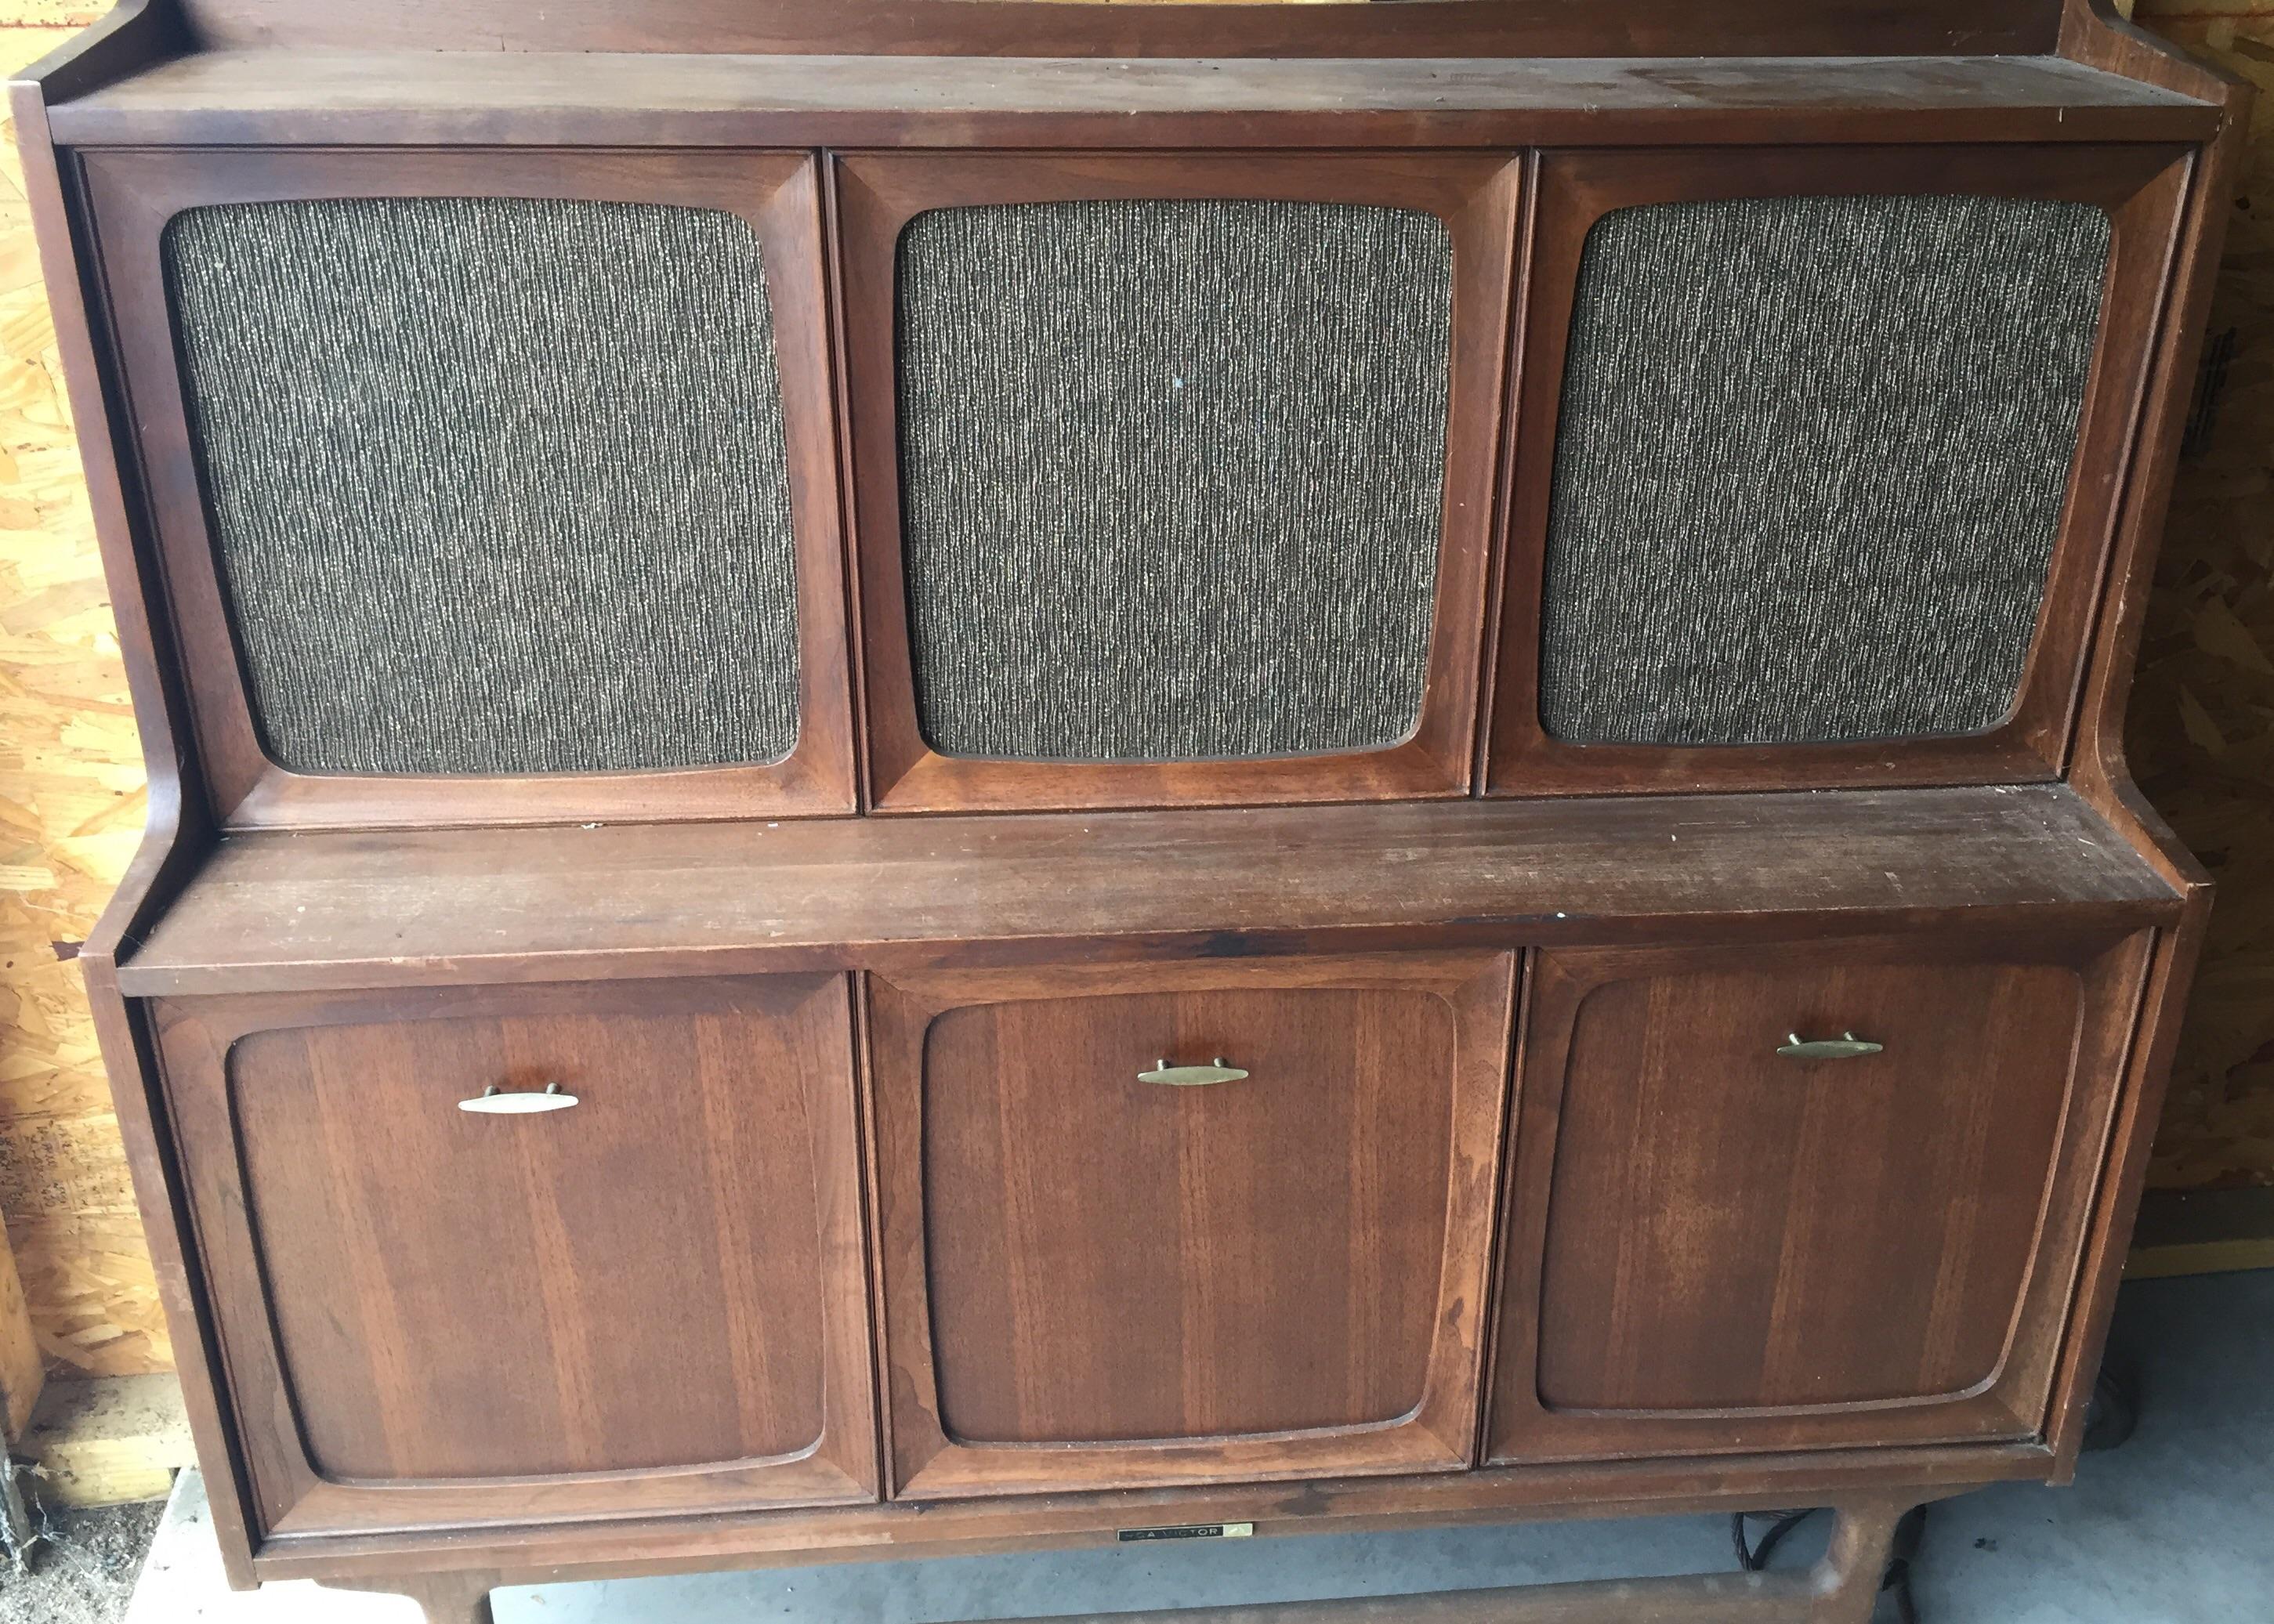 RCA Victor Victrola entertainment console antique appraisal